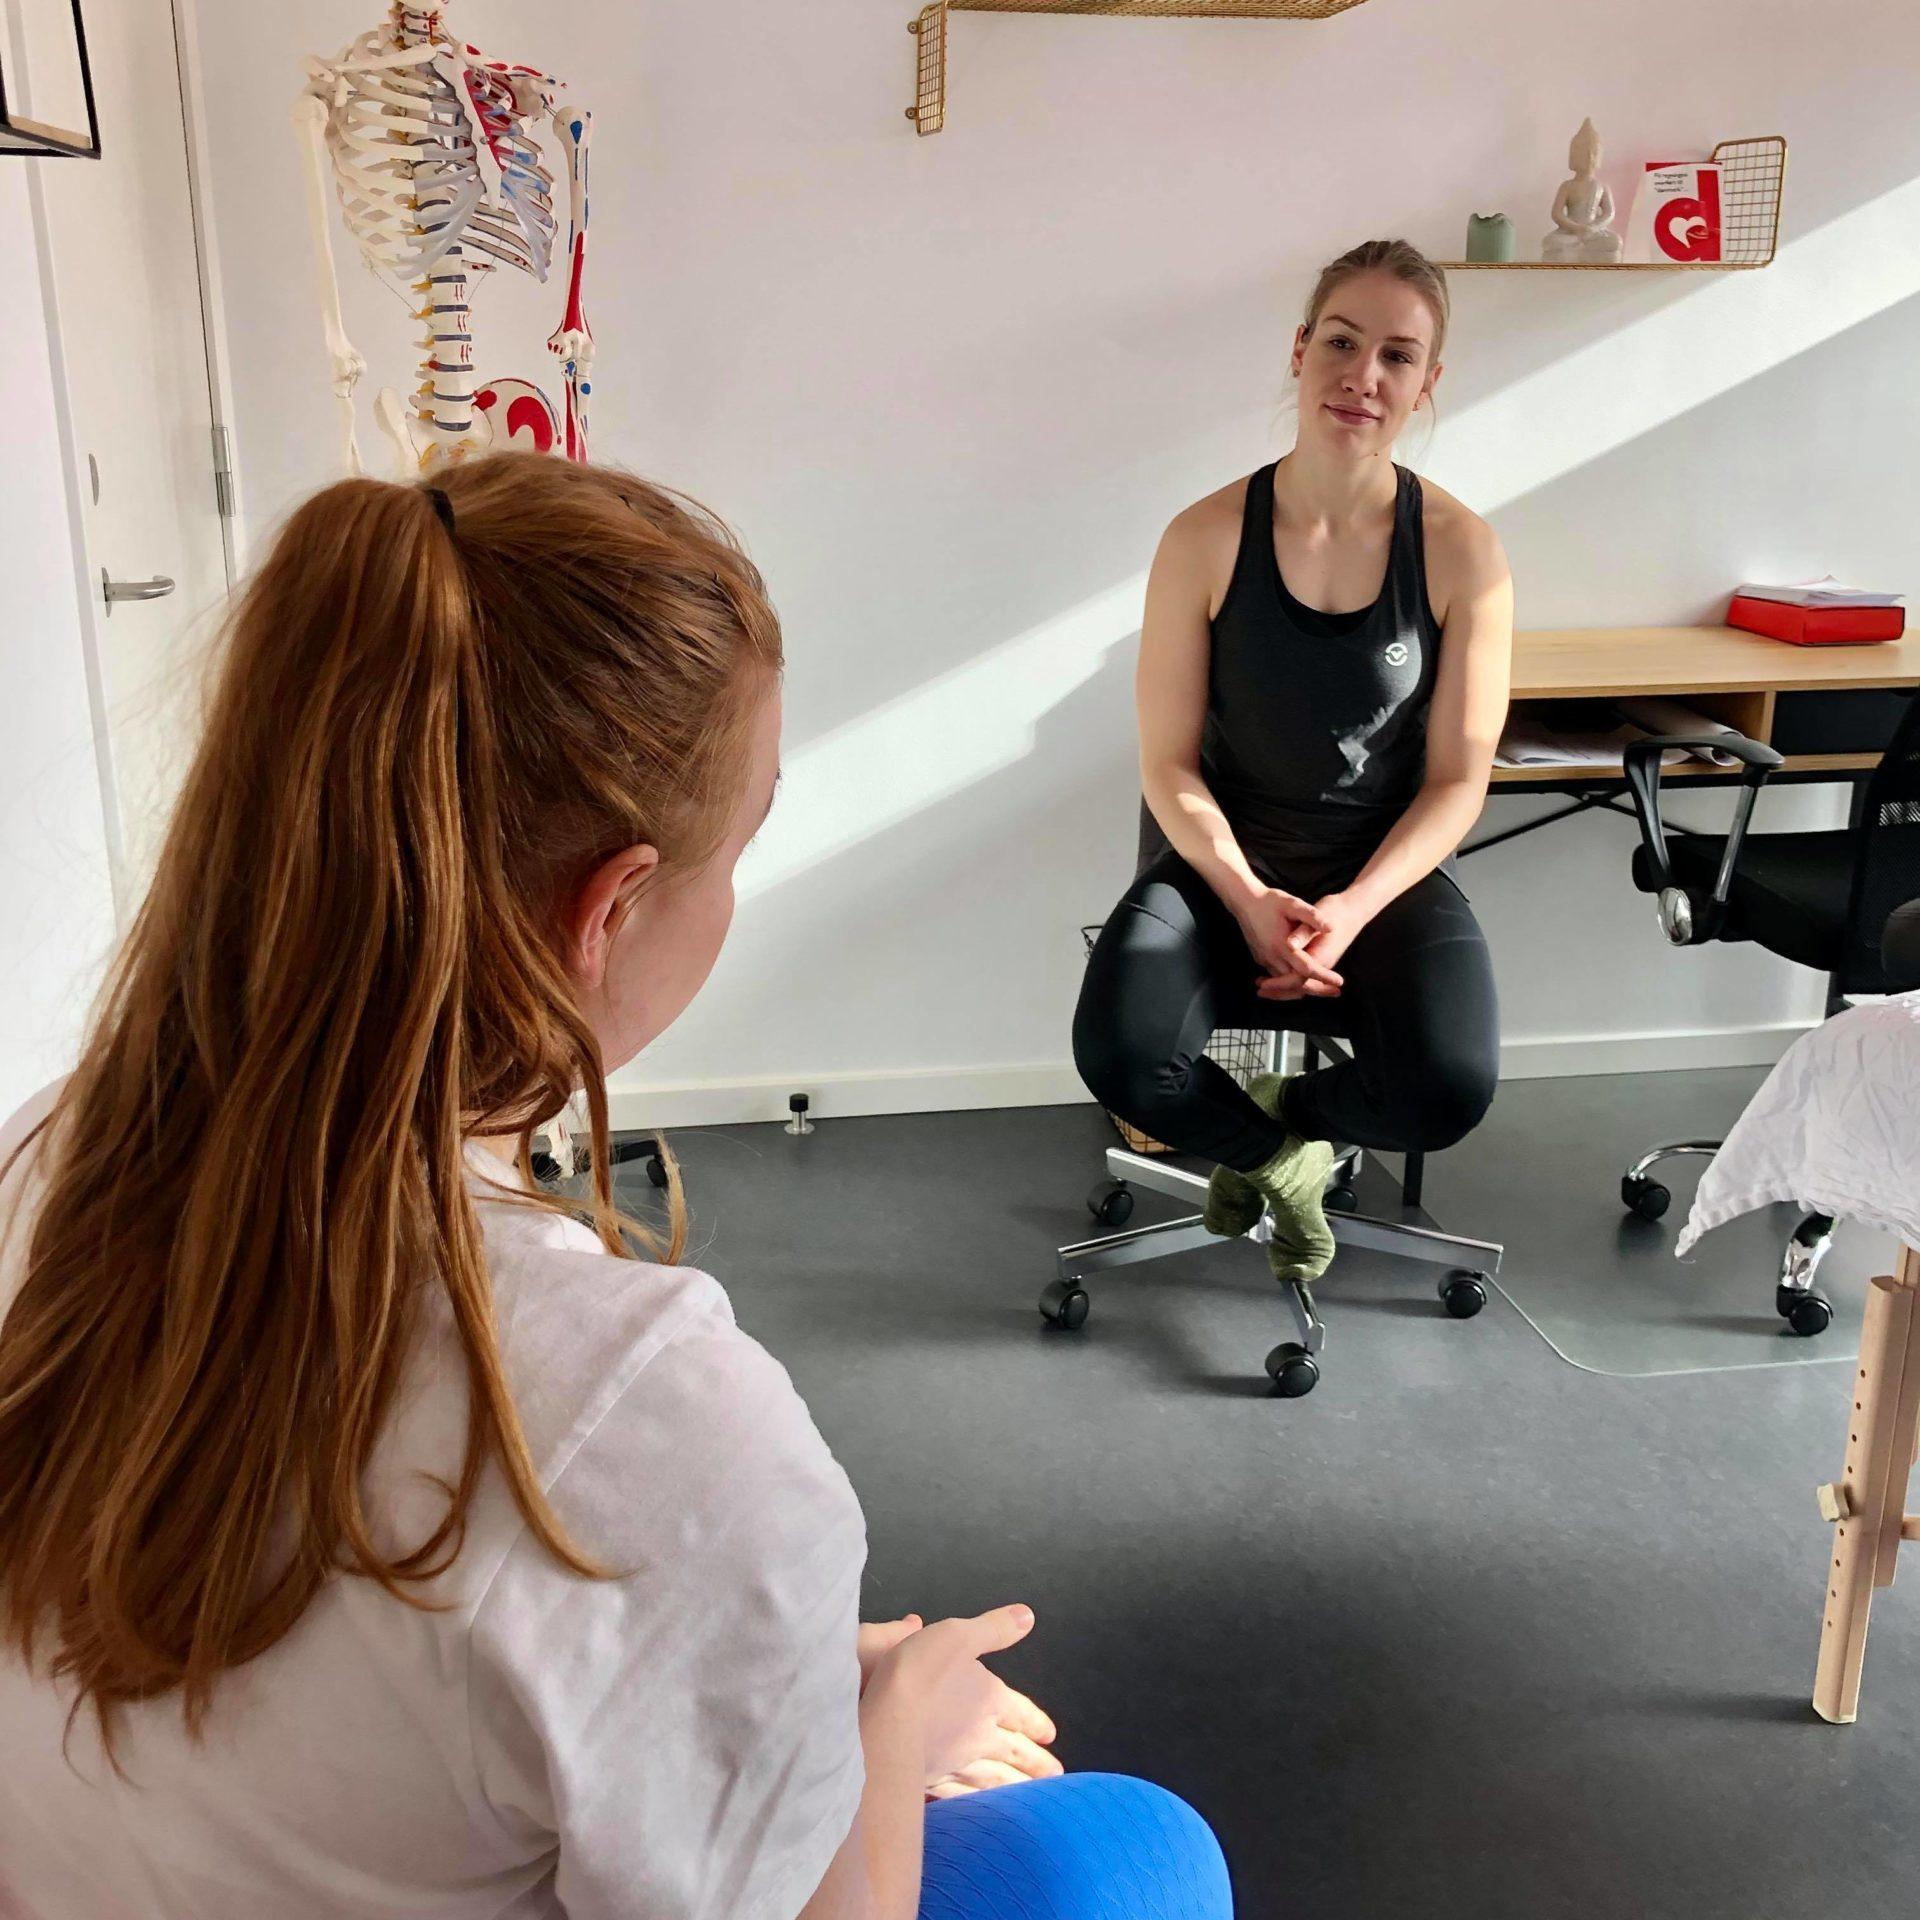 Fysioterapeut Vanløse, Improve Studio, Sofie Ankerstjerne